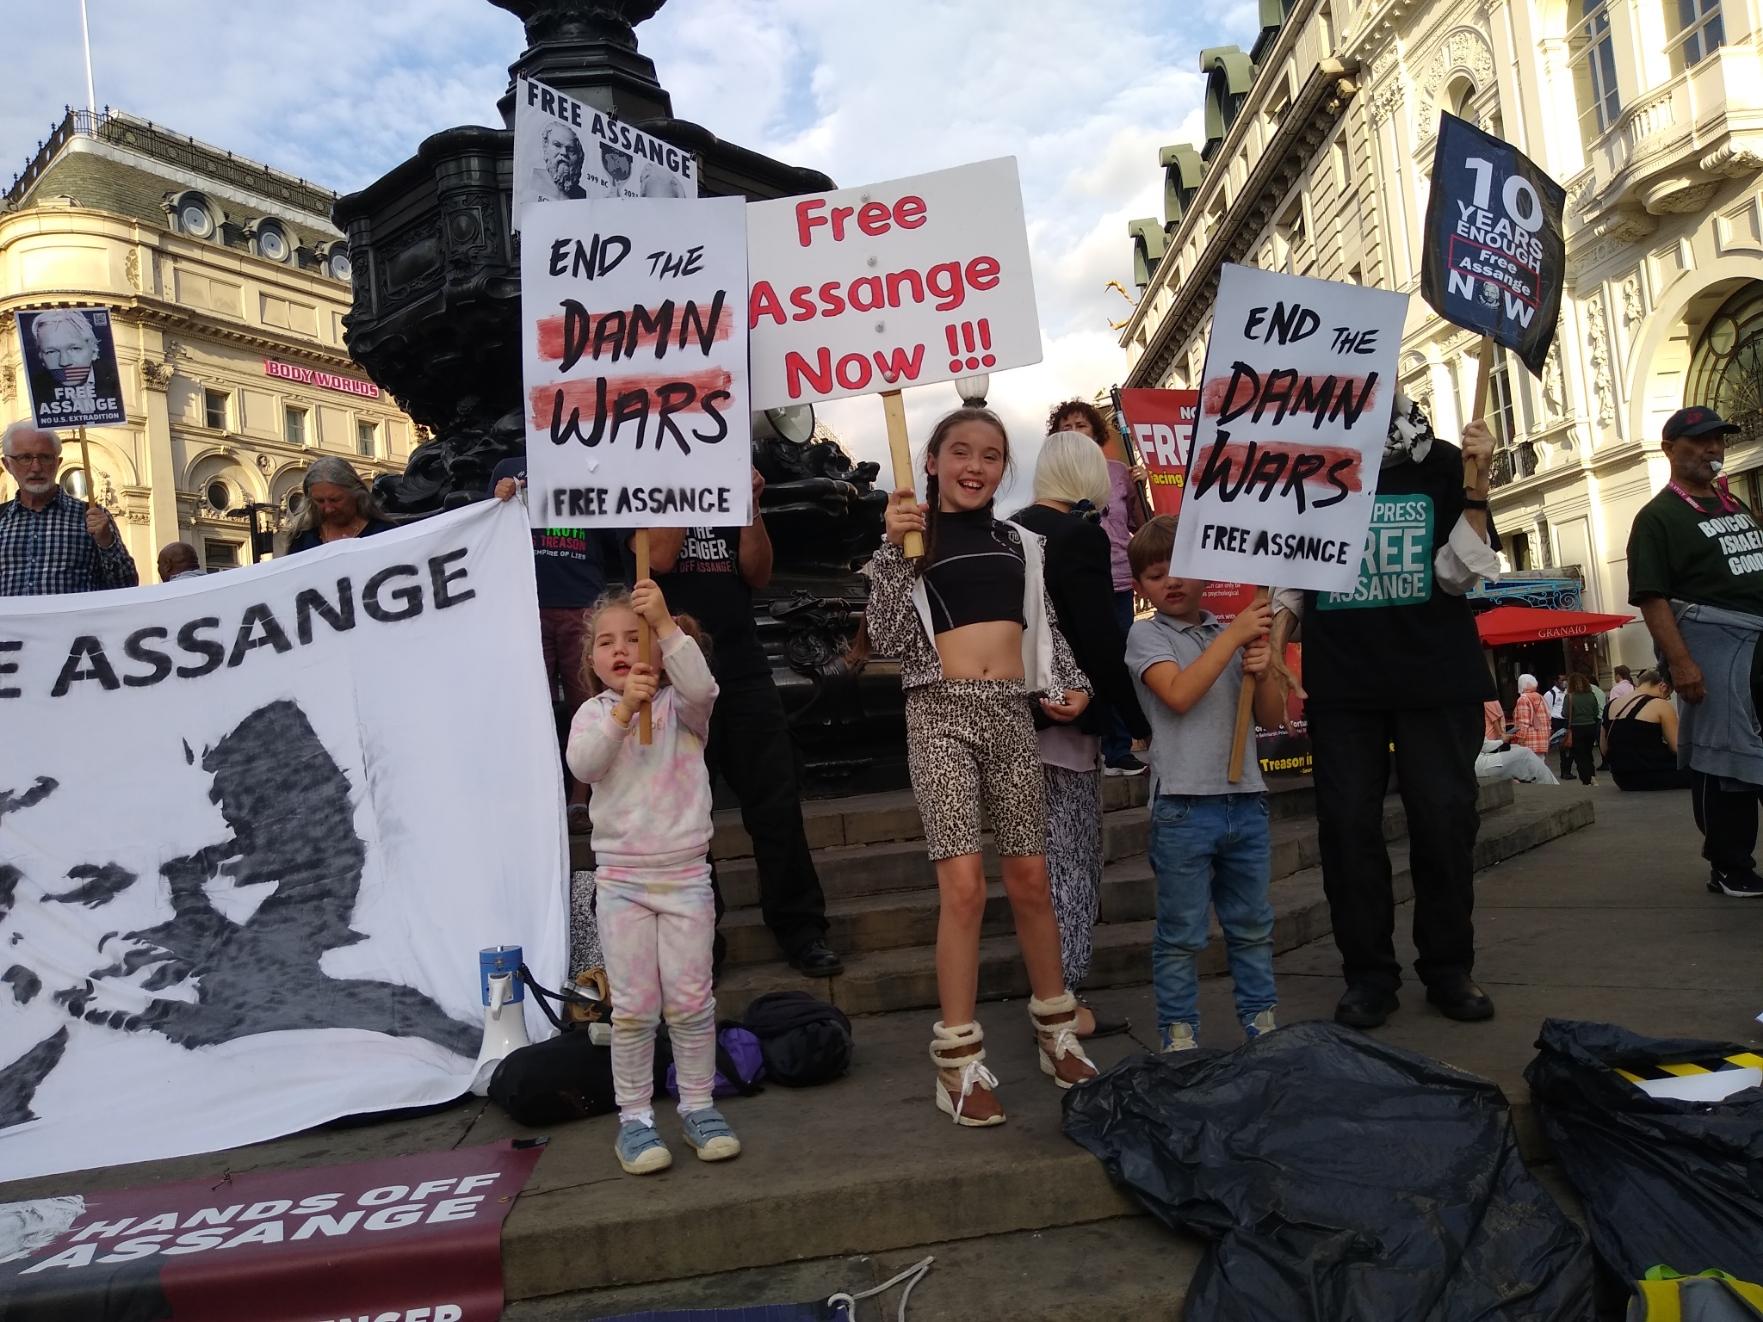 protest_photos:threekids.jpg